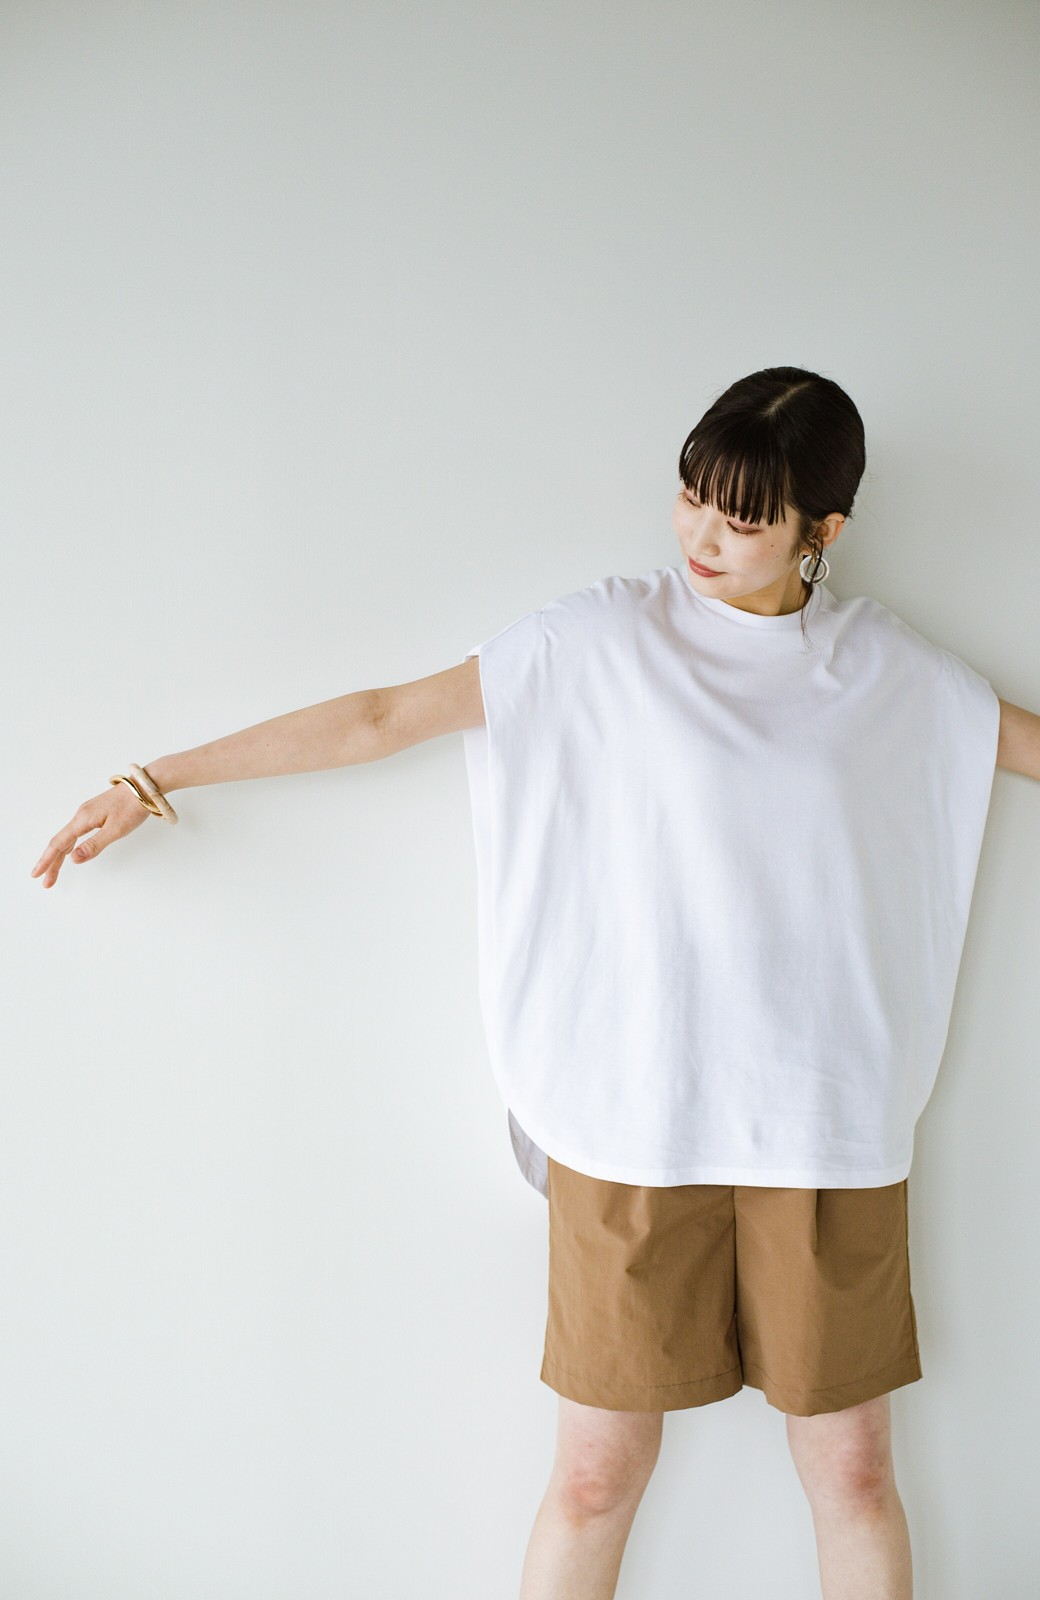 haco! PBPオーガニックコットン 楽ちんなのにブラウス気分で着られる大人のおめかしTシャツ <ホワイト>の商品写真22